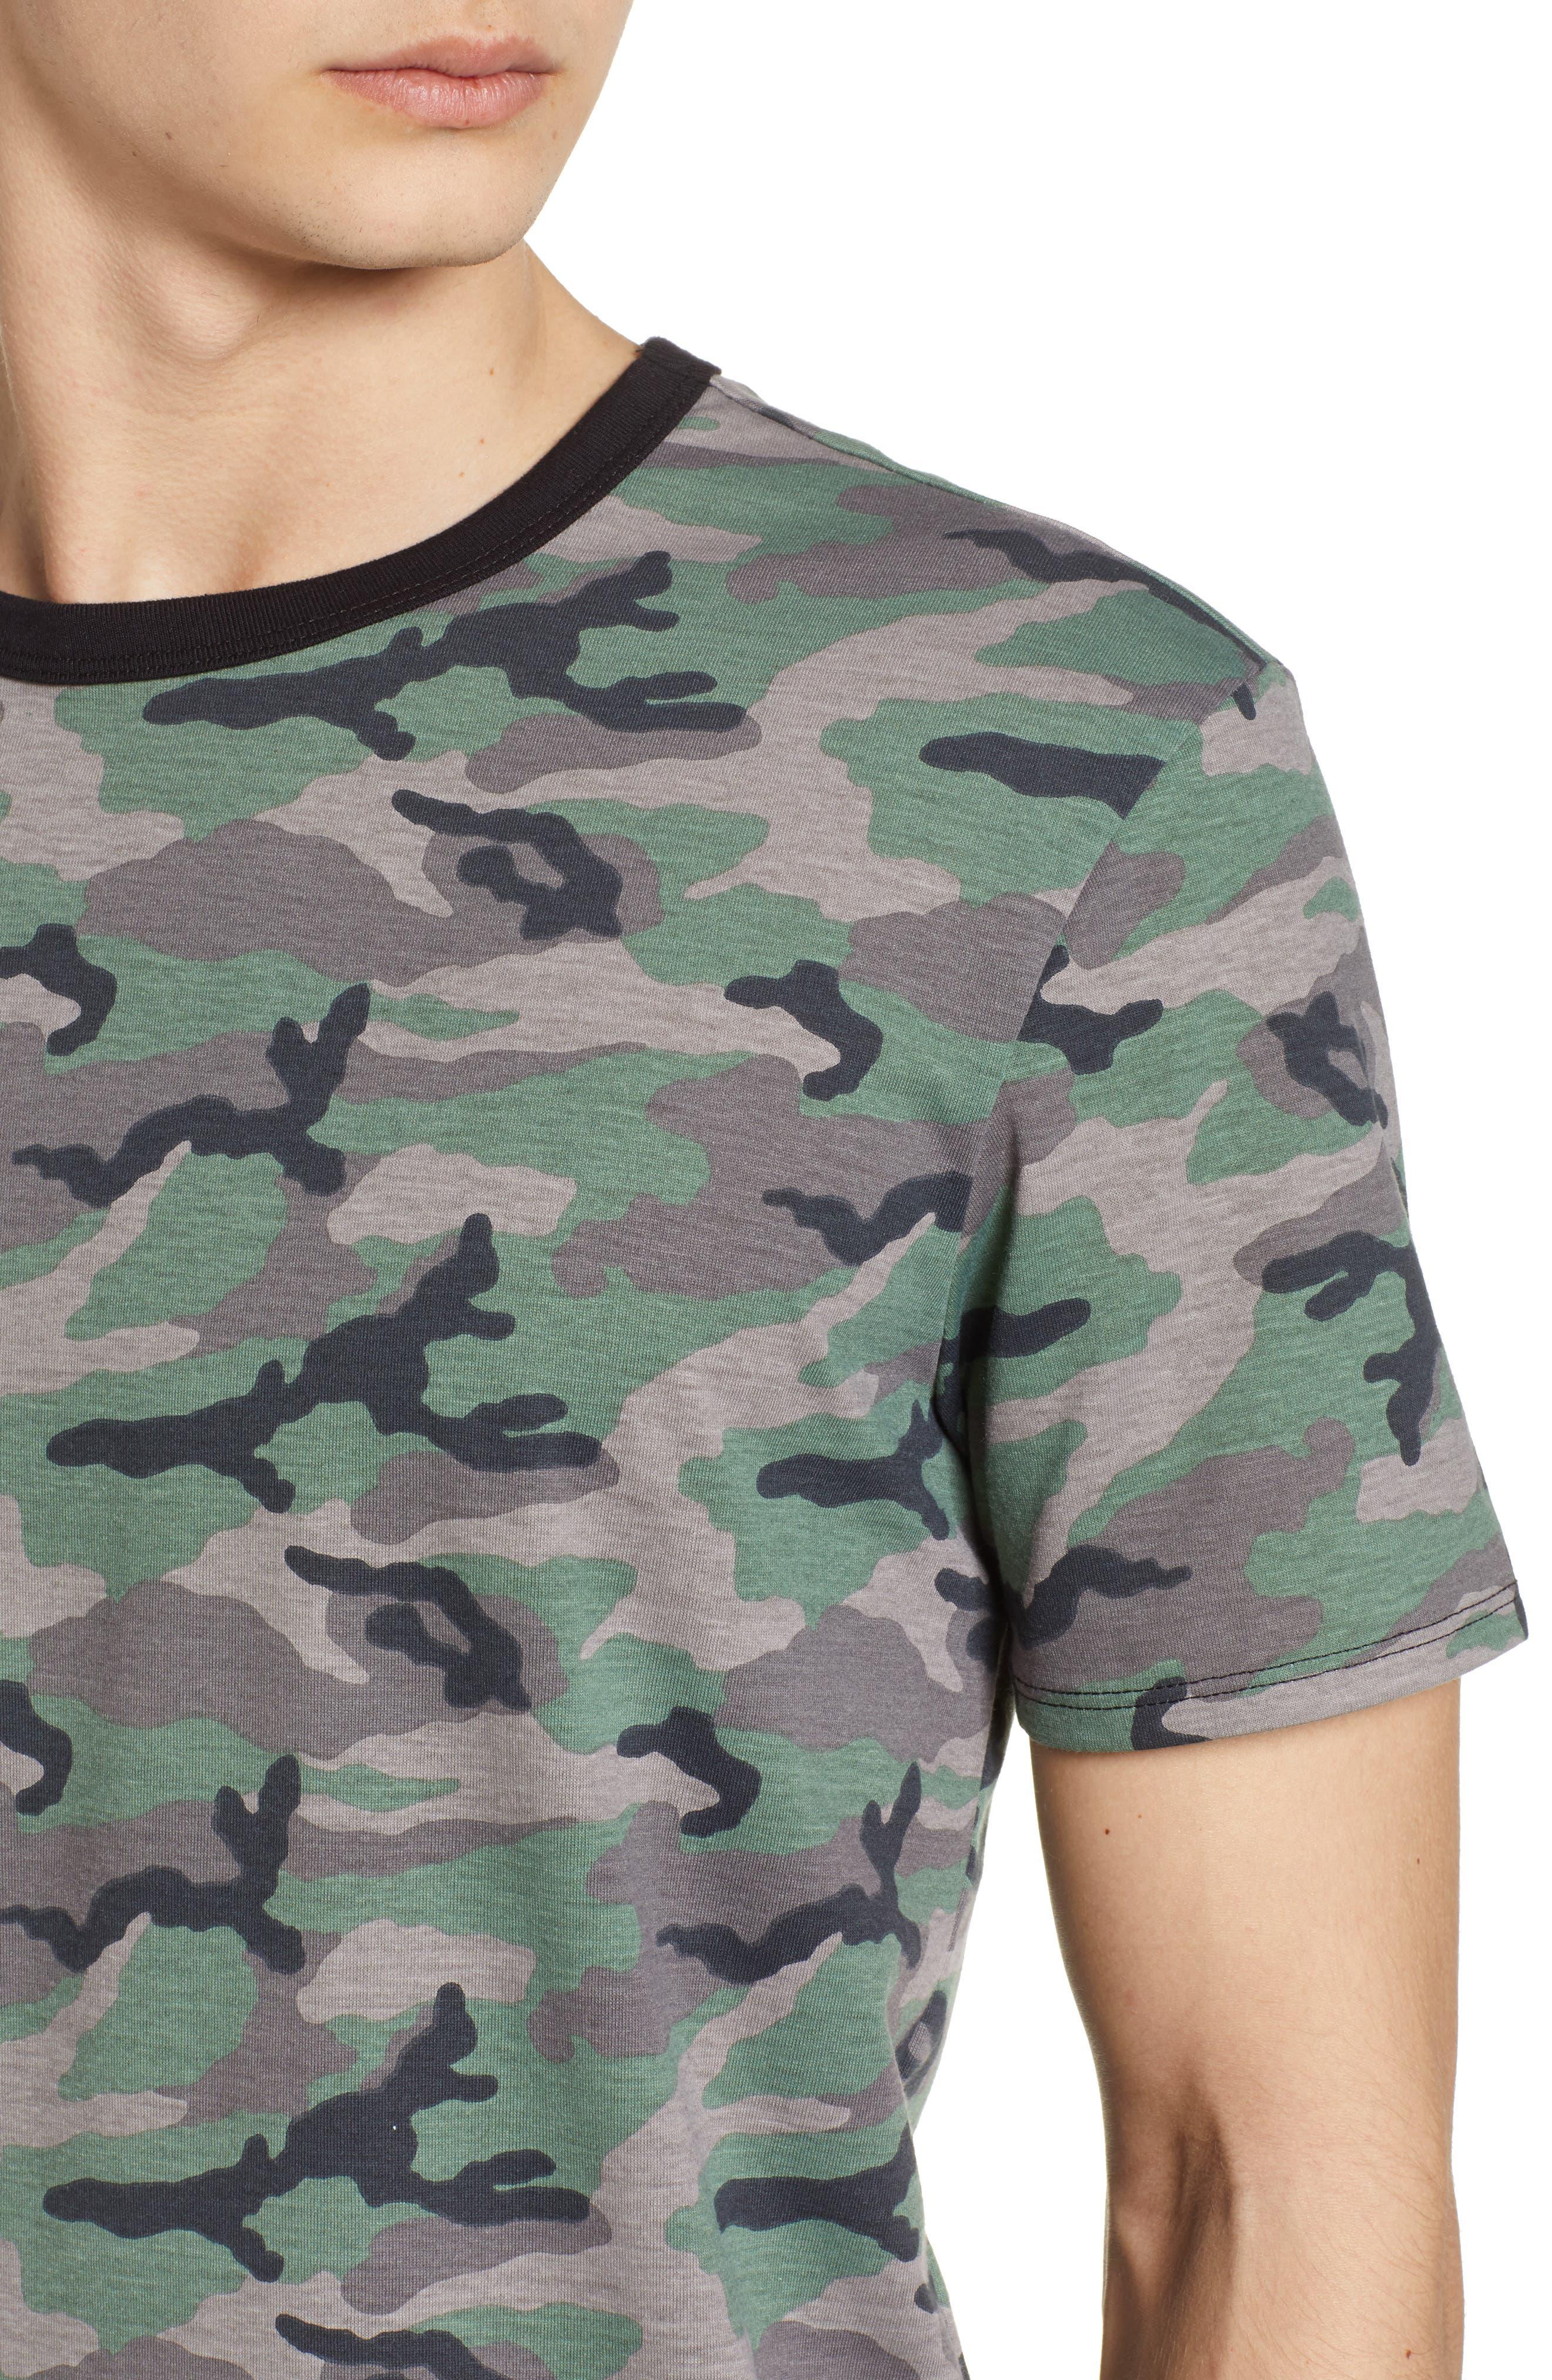 Camo Print Ringer T-Shirt,                             Alternate thumbnail 4, color,                             Brown Green Camo